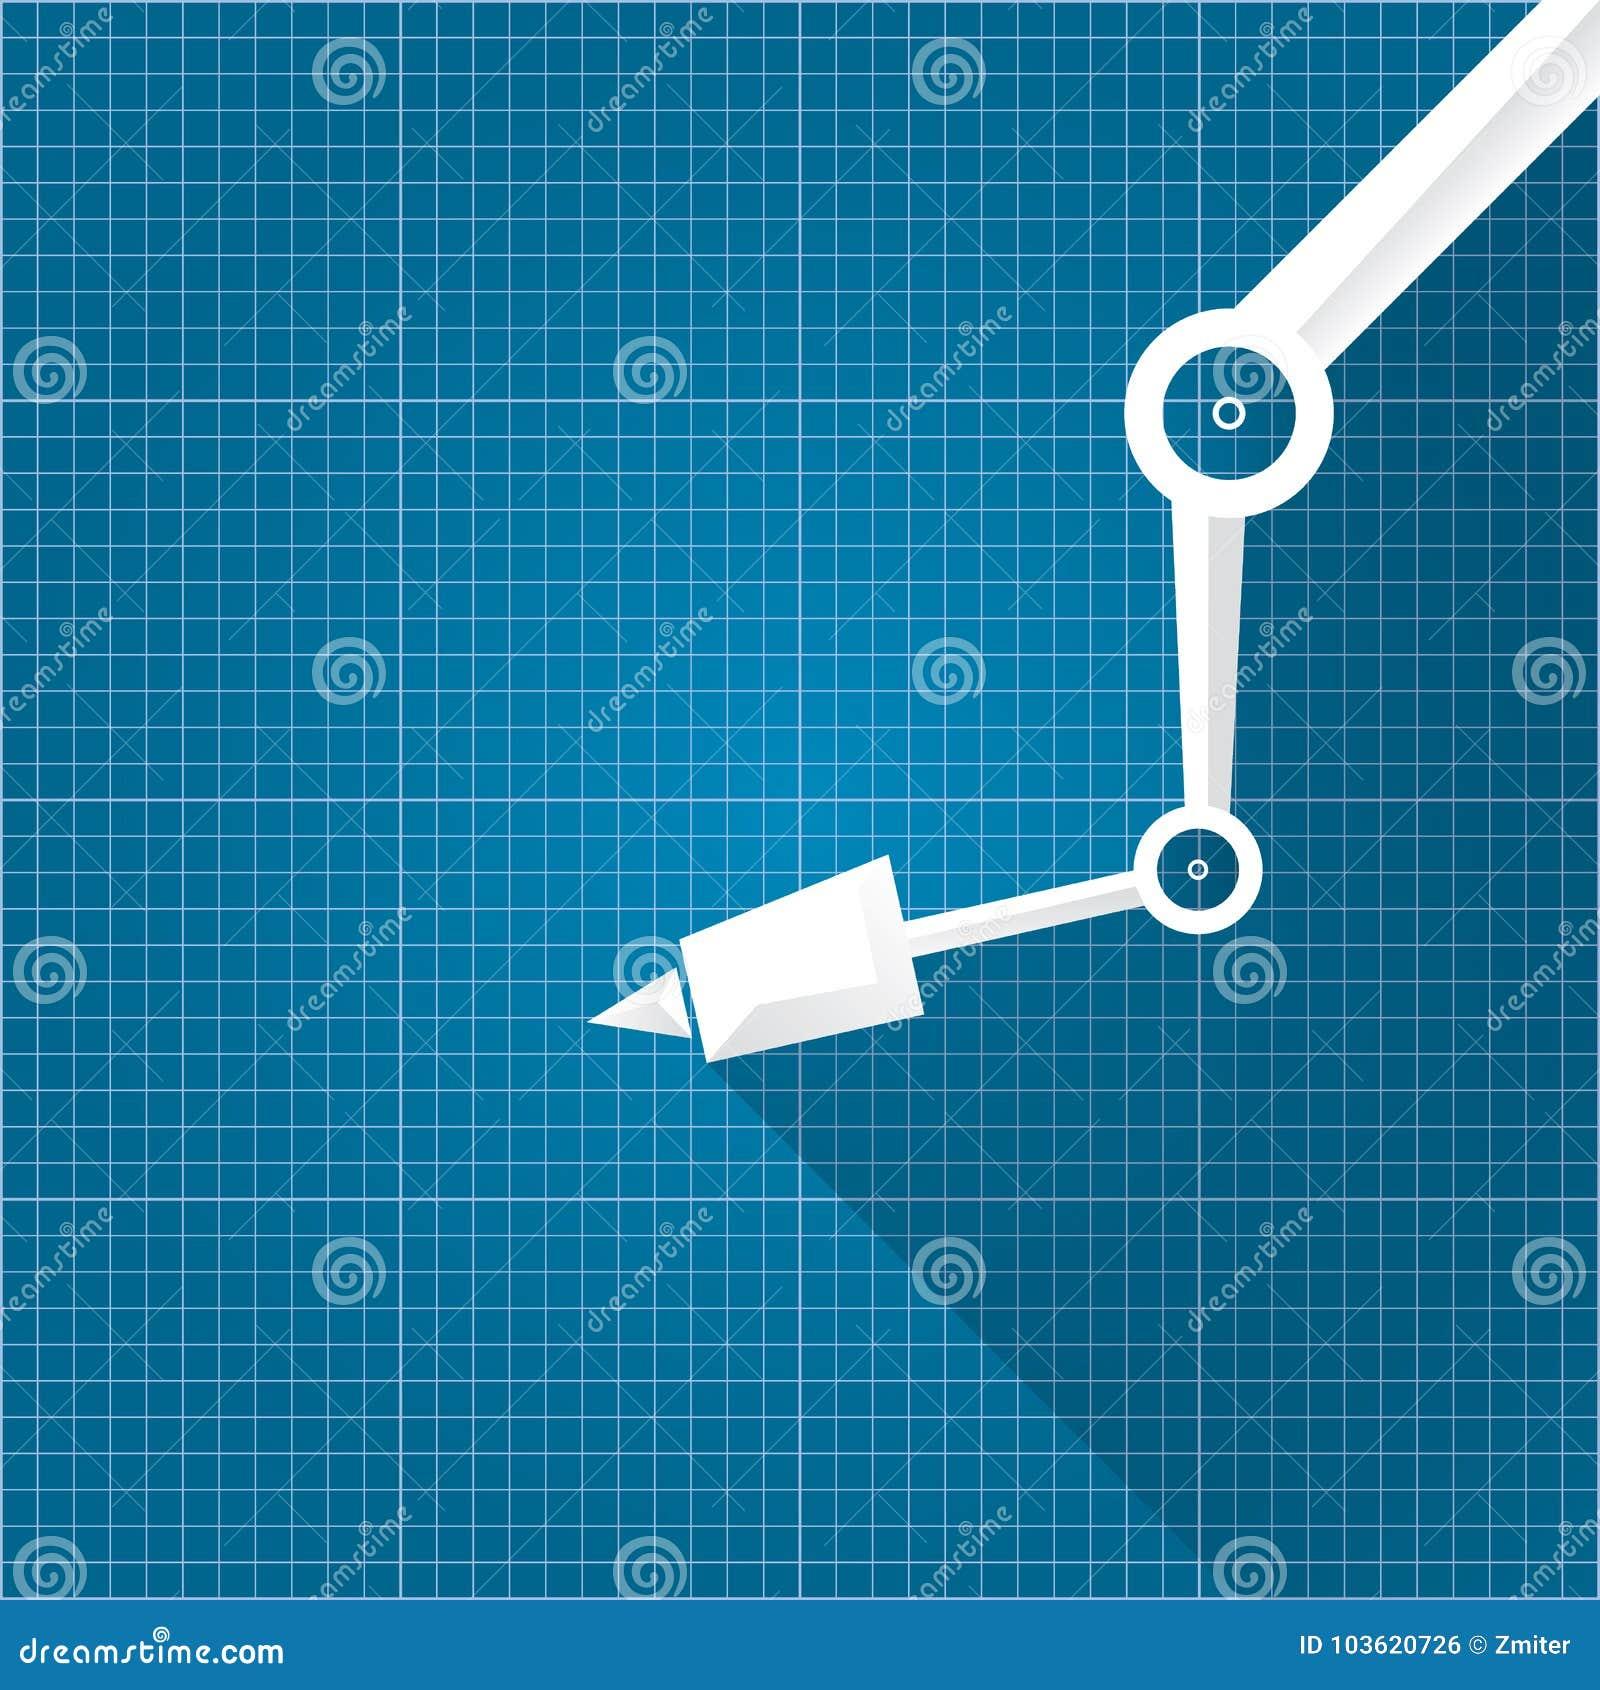 Download Vector Robotic Arm Symbol On Blueprint Paper Background. Robot  Hand. Technology Background Design